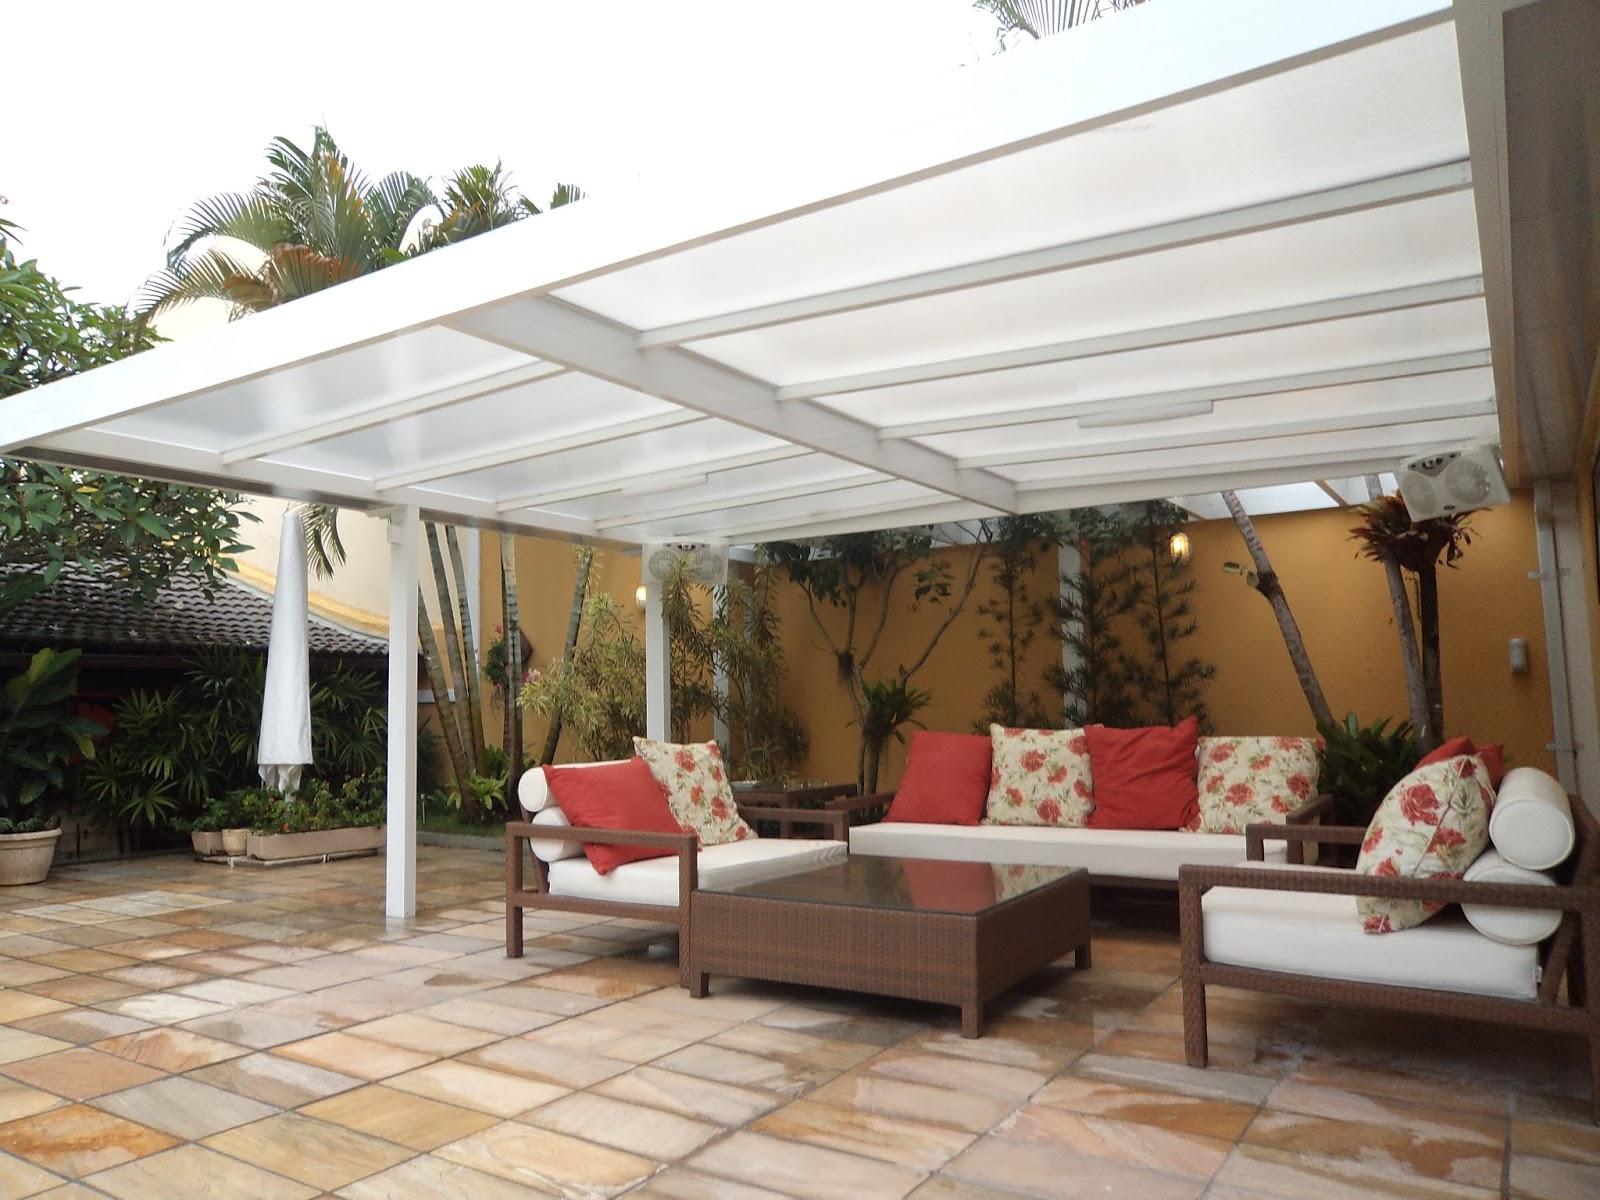 Limpeza em uma cobertura de policarbonato minimax toldos - Toldos para patios exteriores ...